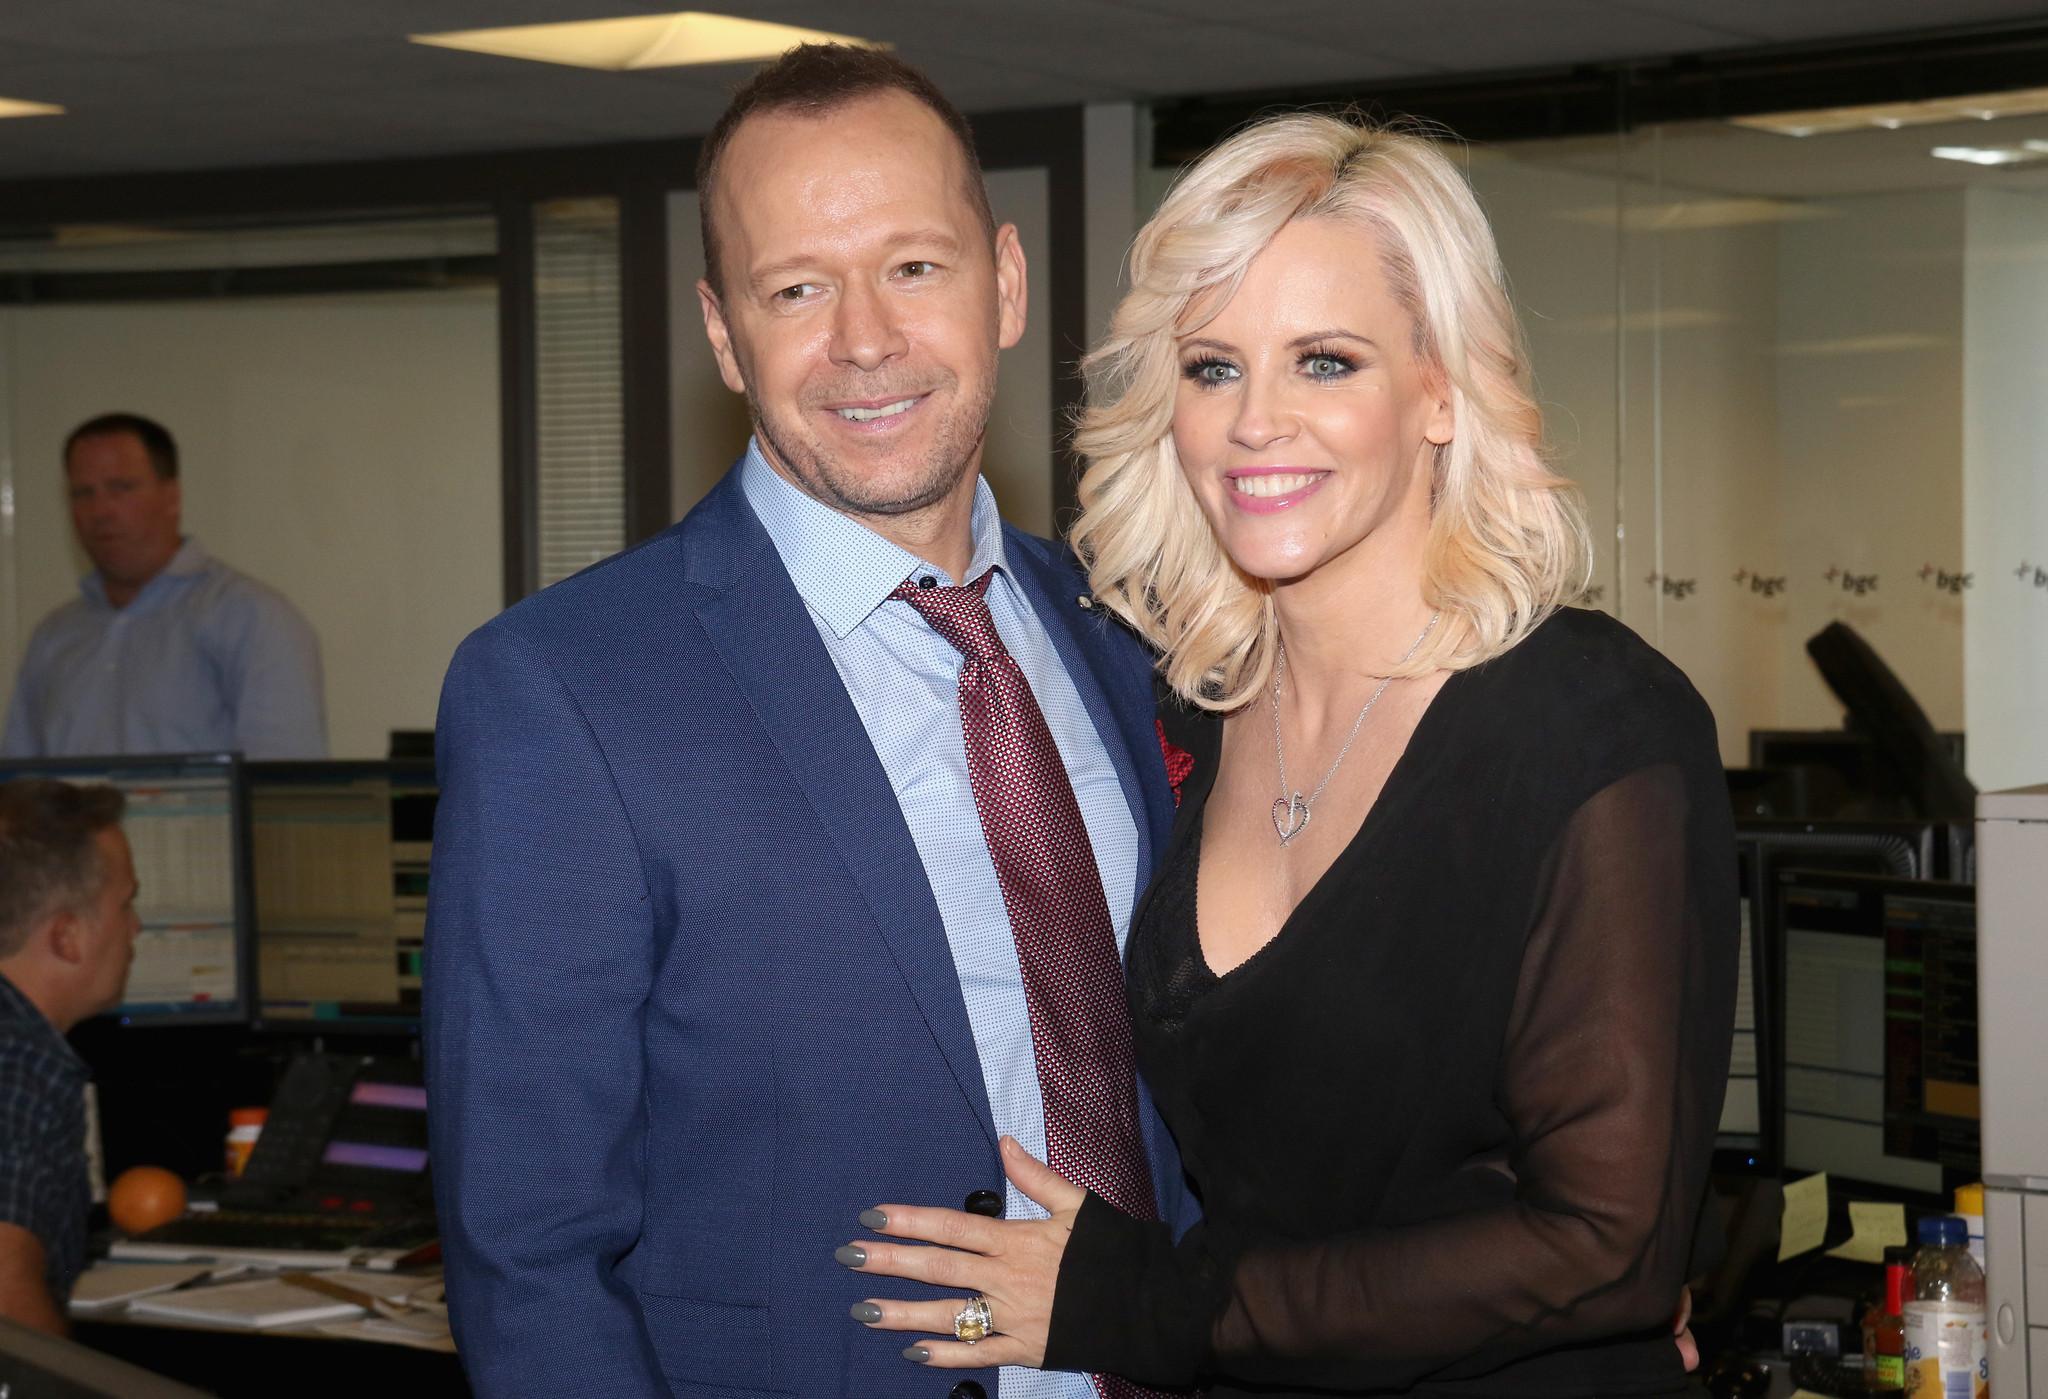 Amid split rumors, Jenny McCarthy praises marriage to ...